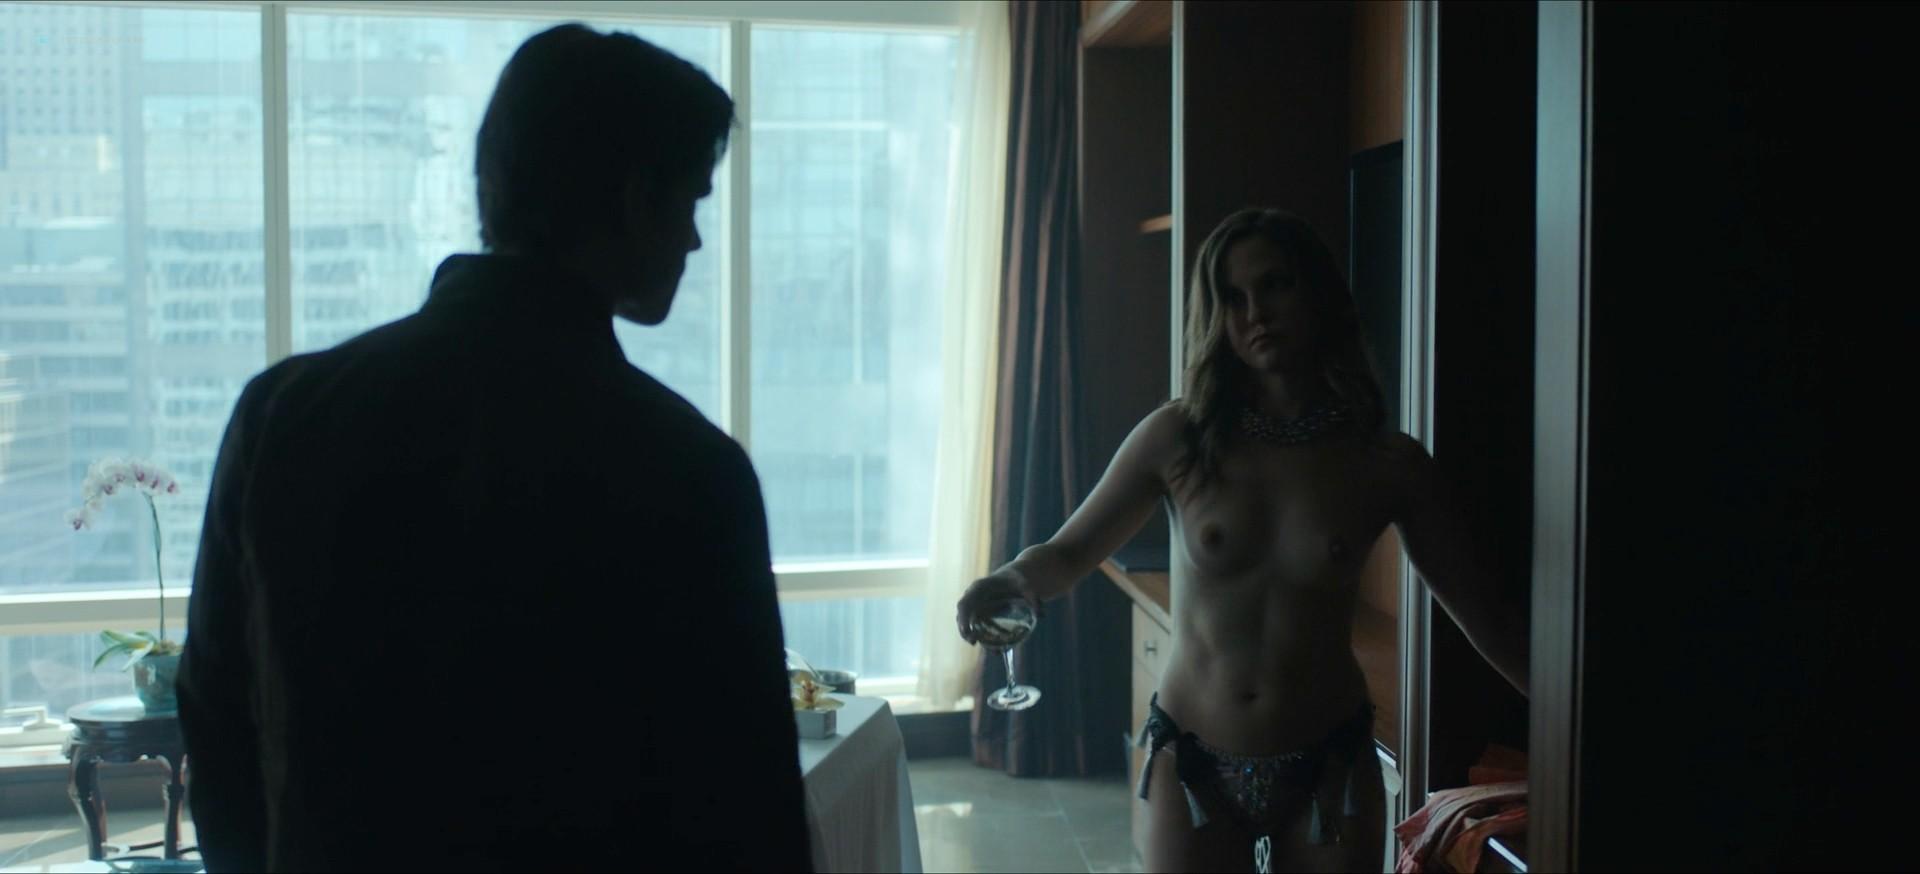 Jennifer Krukowski nude topless Devoshia Cooper nude too - Titans (2019) s2e7 1080p (7)